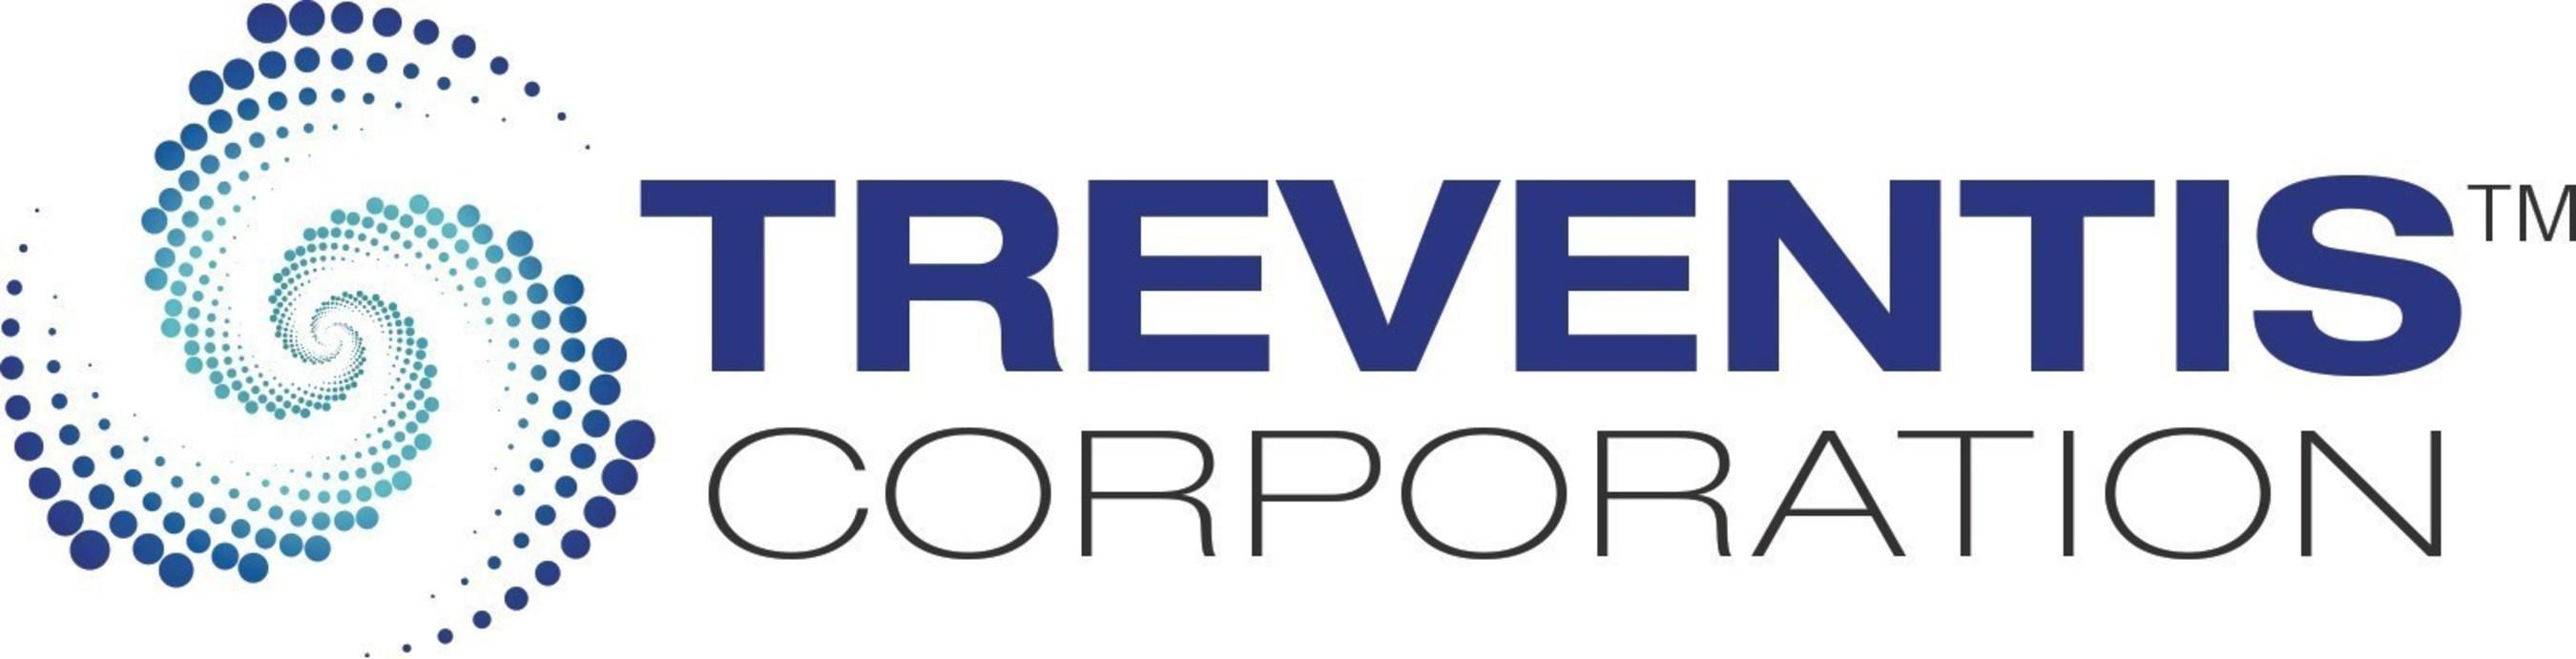 Treventis Corporation